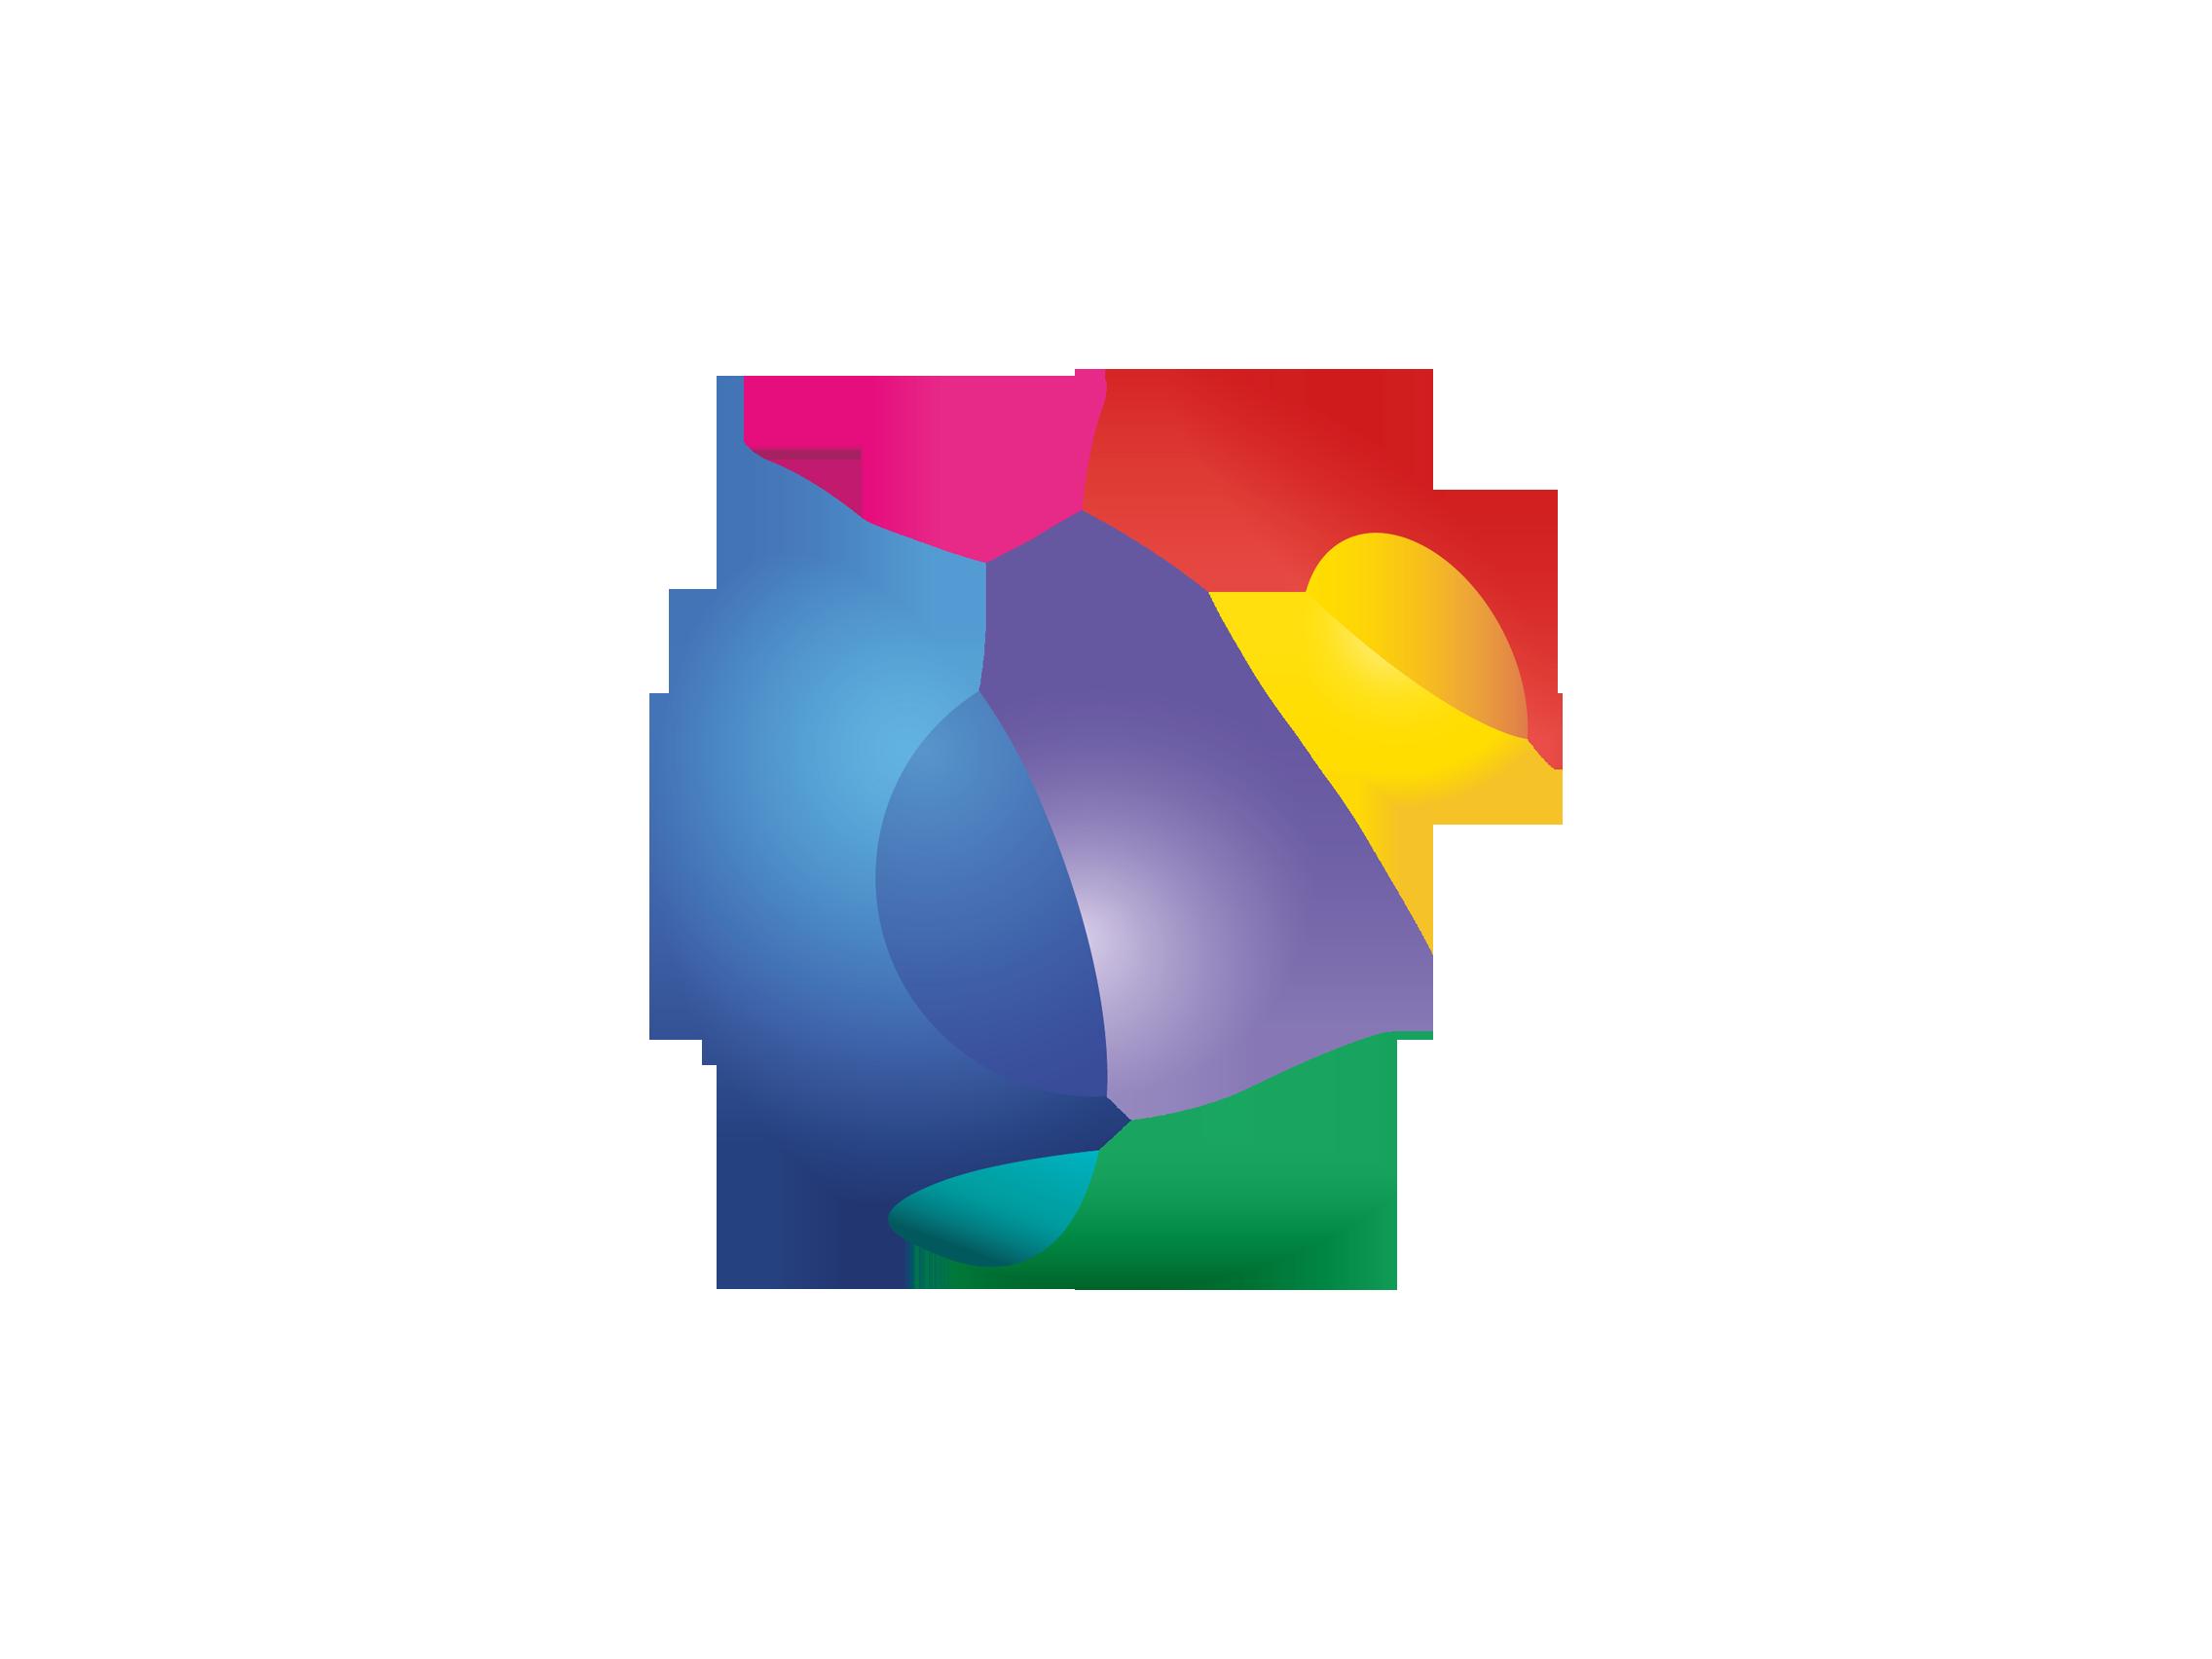 Telecom Logo Wallpaper